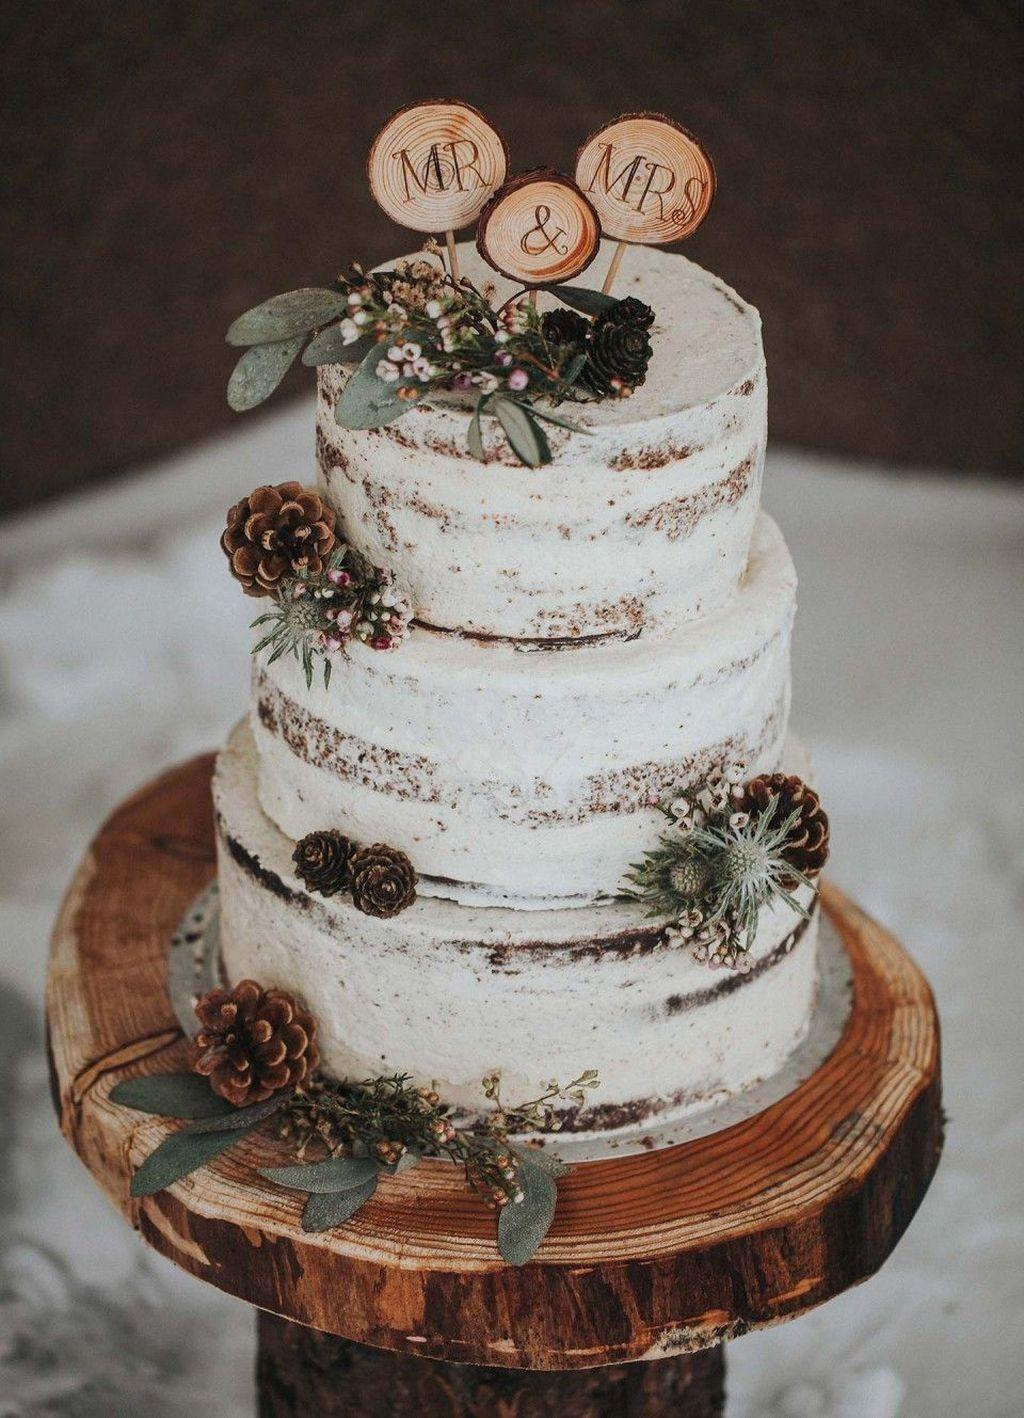 Mr & Mrs rustic Christmas cake